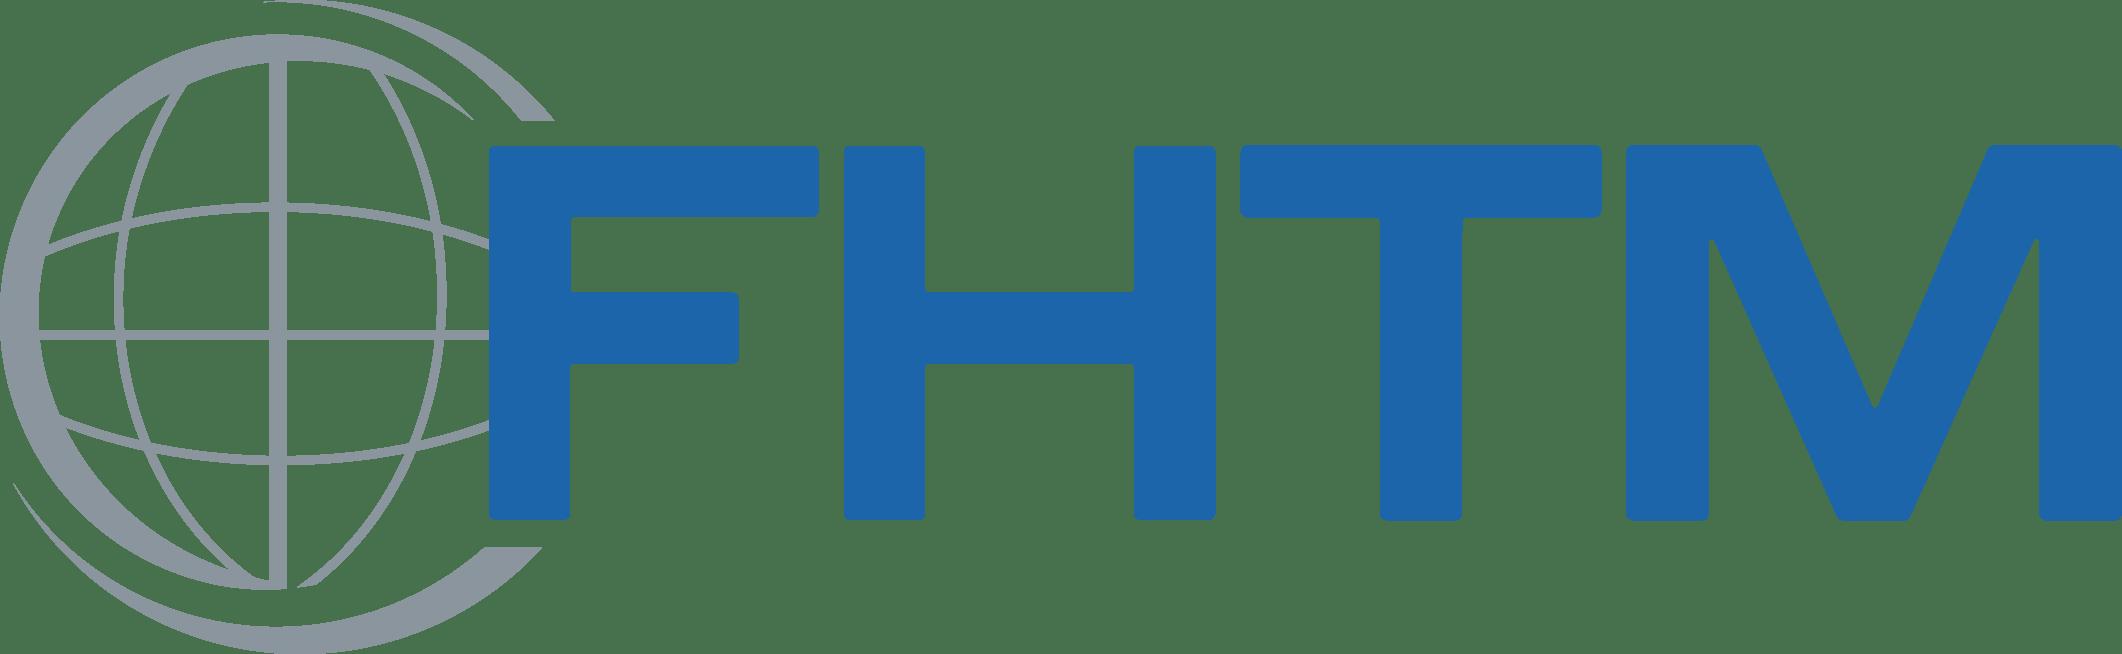 Fortune Hi-Tech Marketing (FHTM) Logo